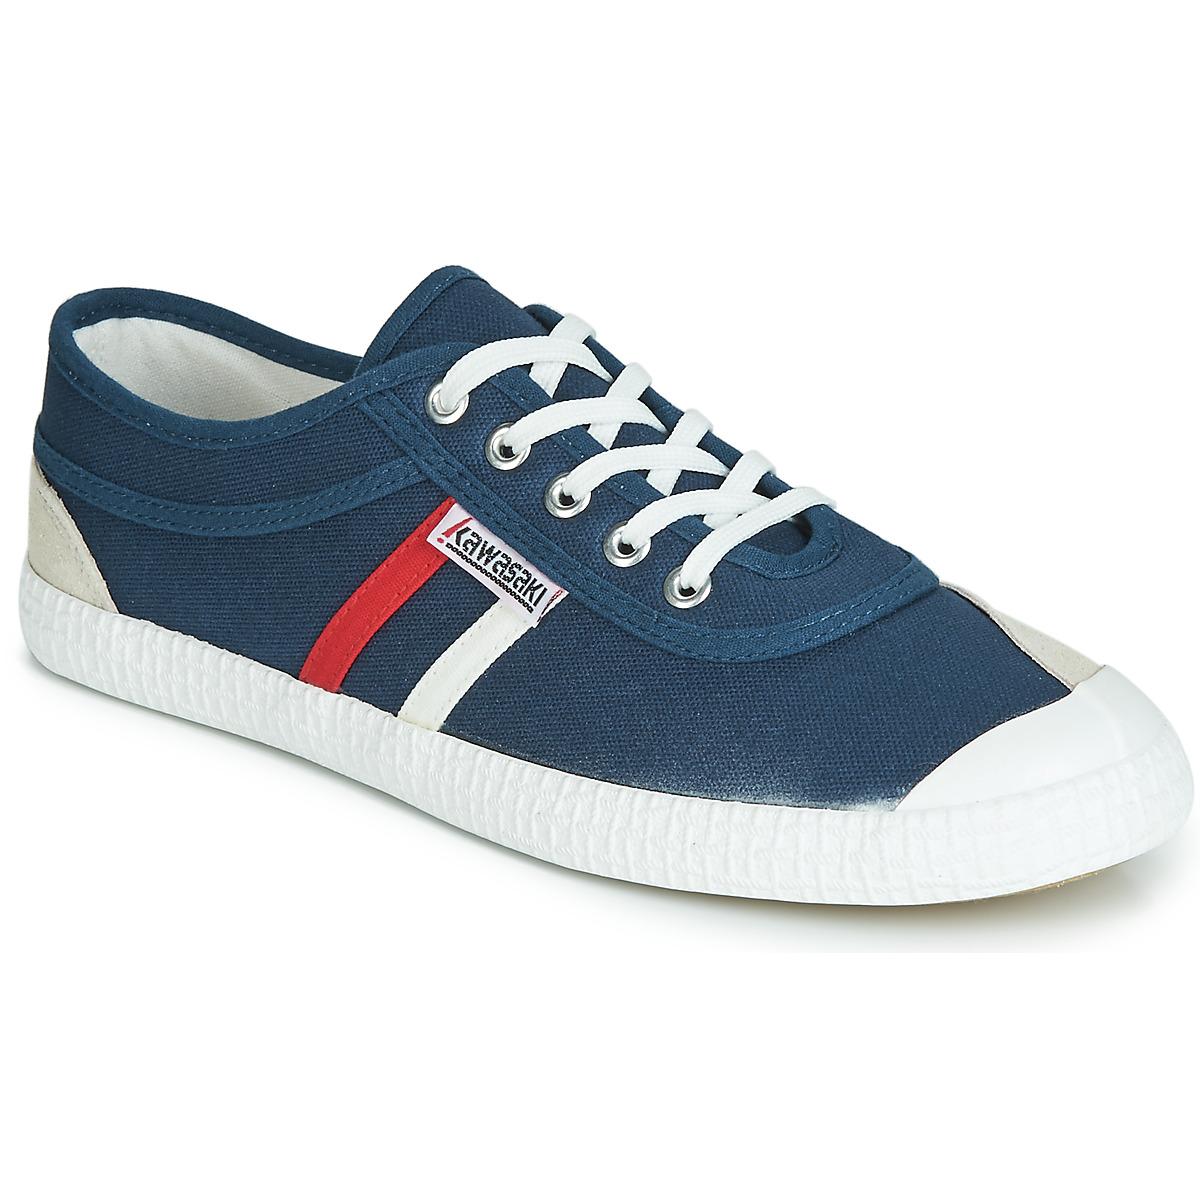 Sneakers Kawasaki  Orignal - Navy = 2002